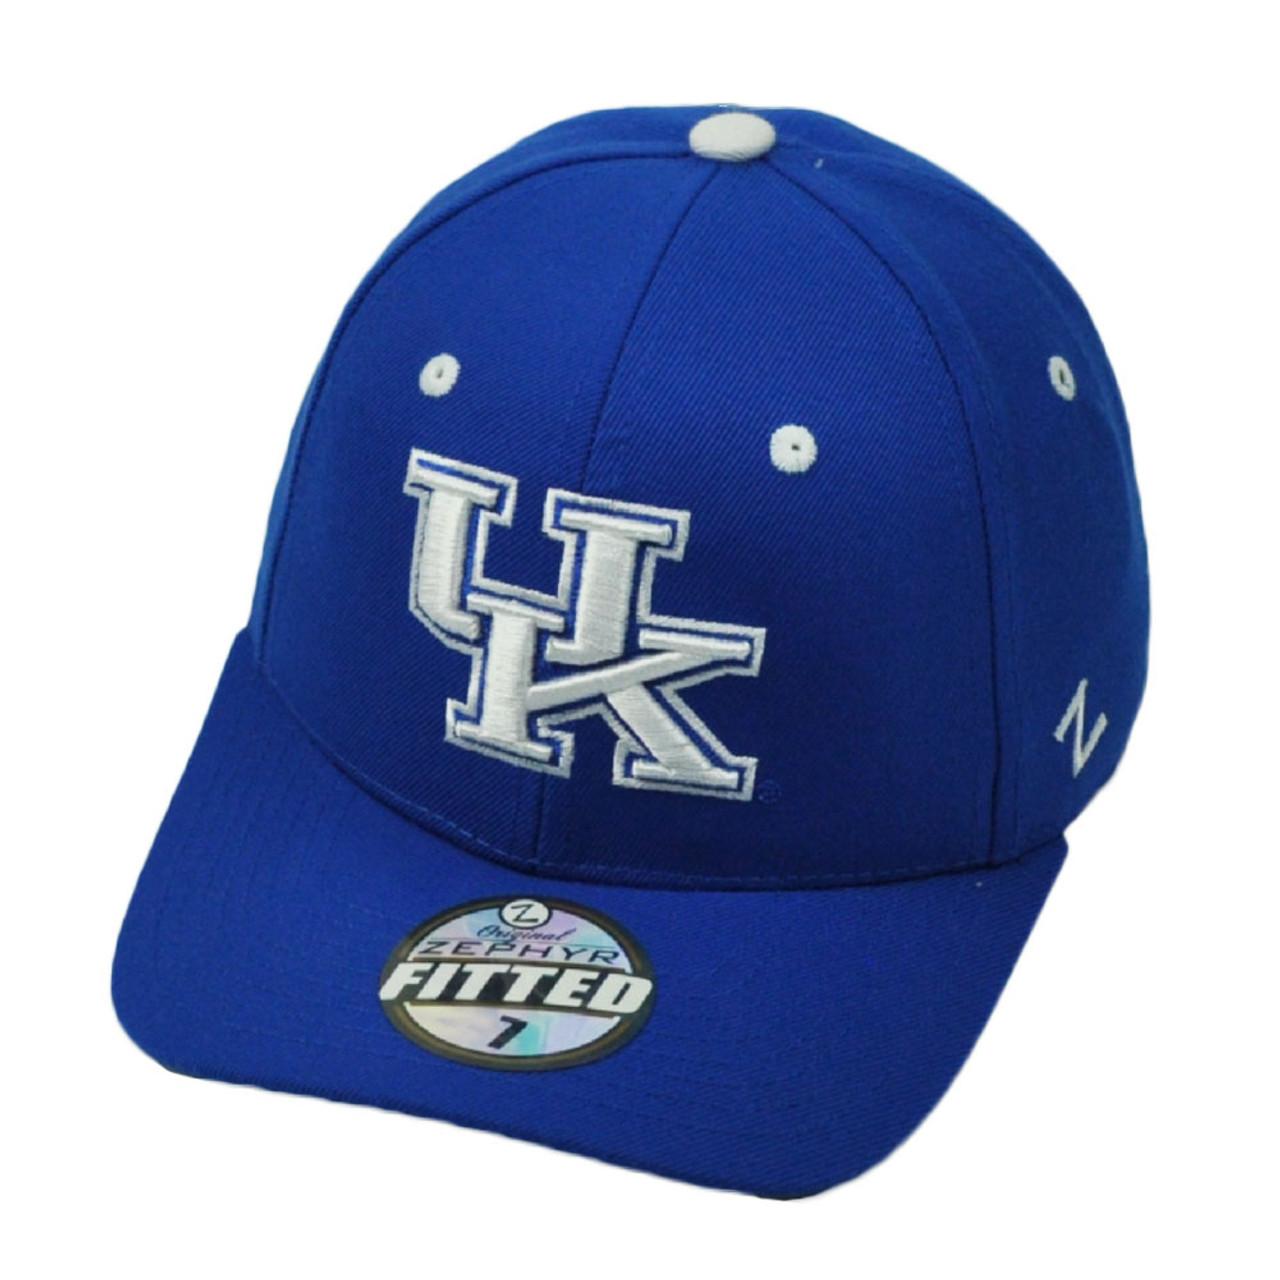 quality design 00389 1ef74 NCAA Original Zephyr Kentucky Wildcats Fitted Size Curved Bill Hat Cap Blue  - Cap Store Online.com